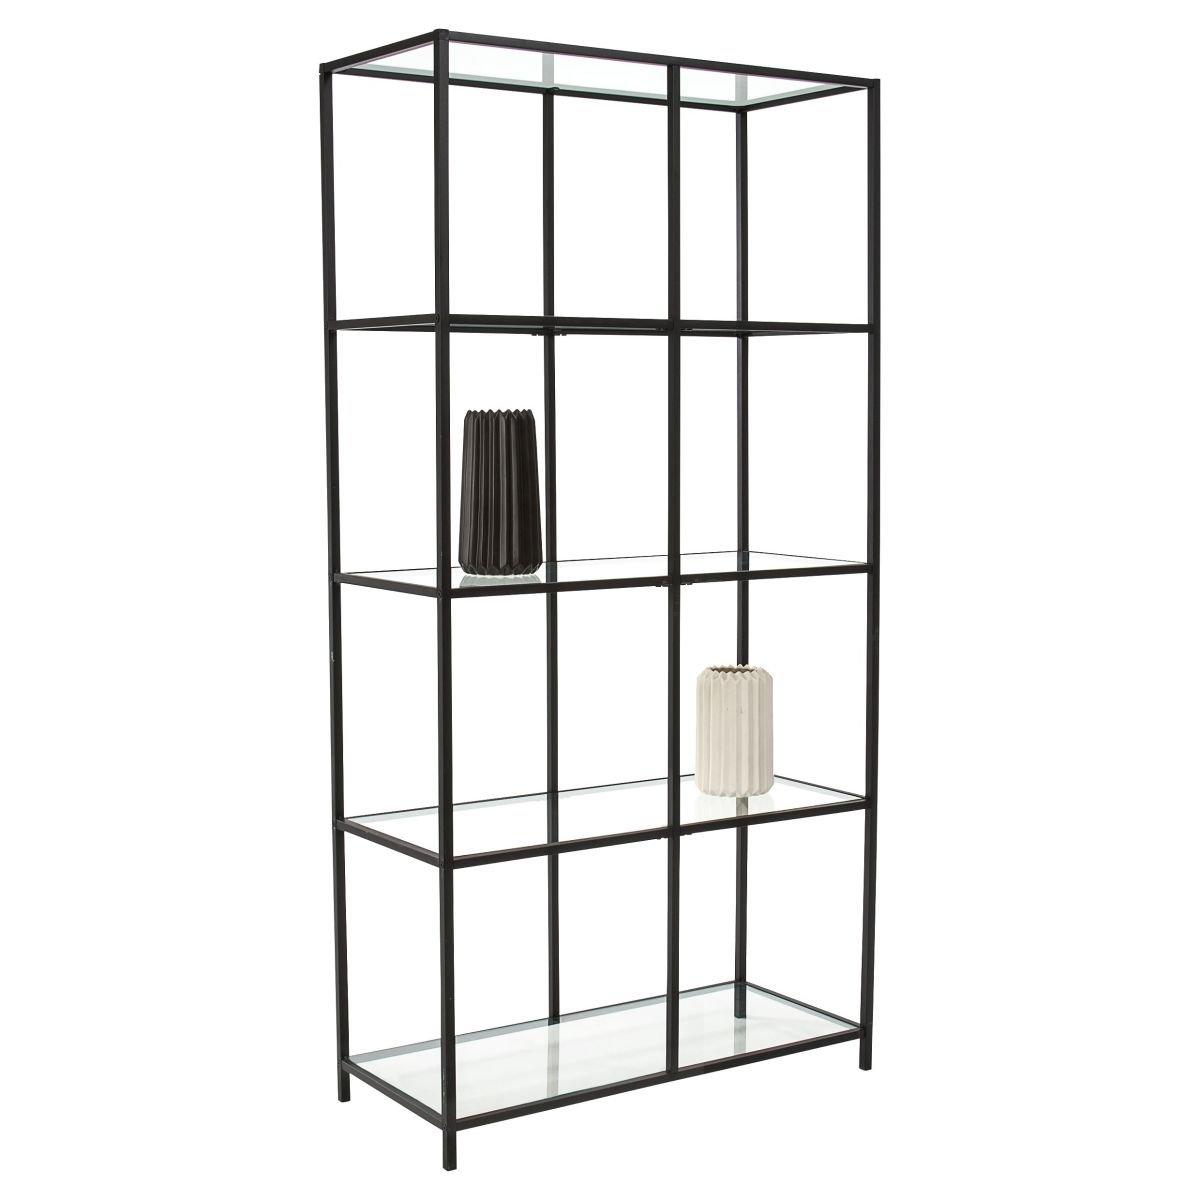 Miavilla Regal Larson - Modernes Standregal - Metall Glas- Schwarz